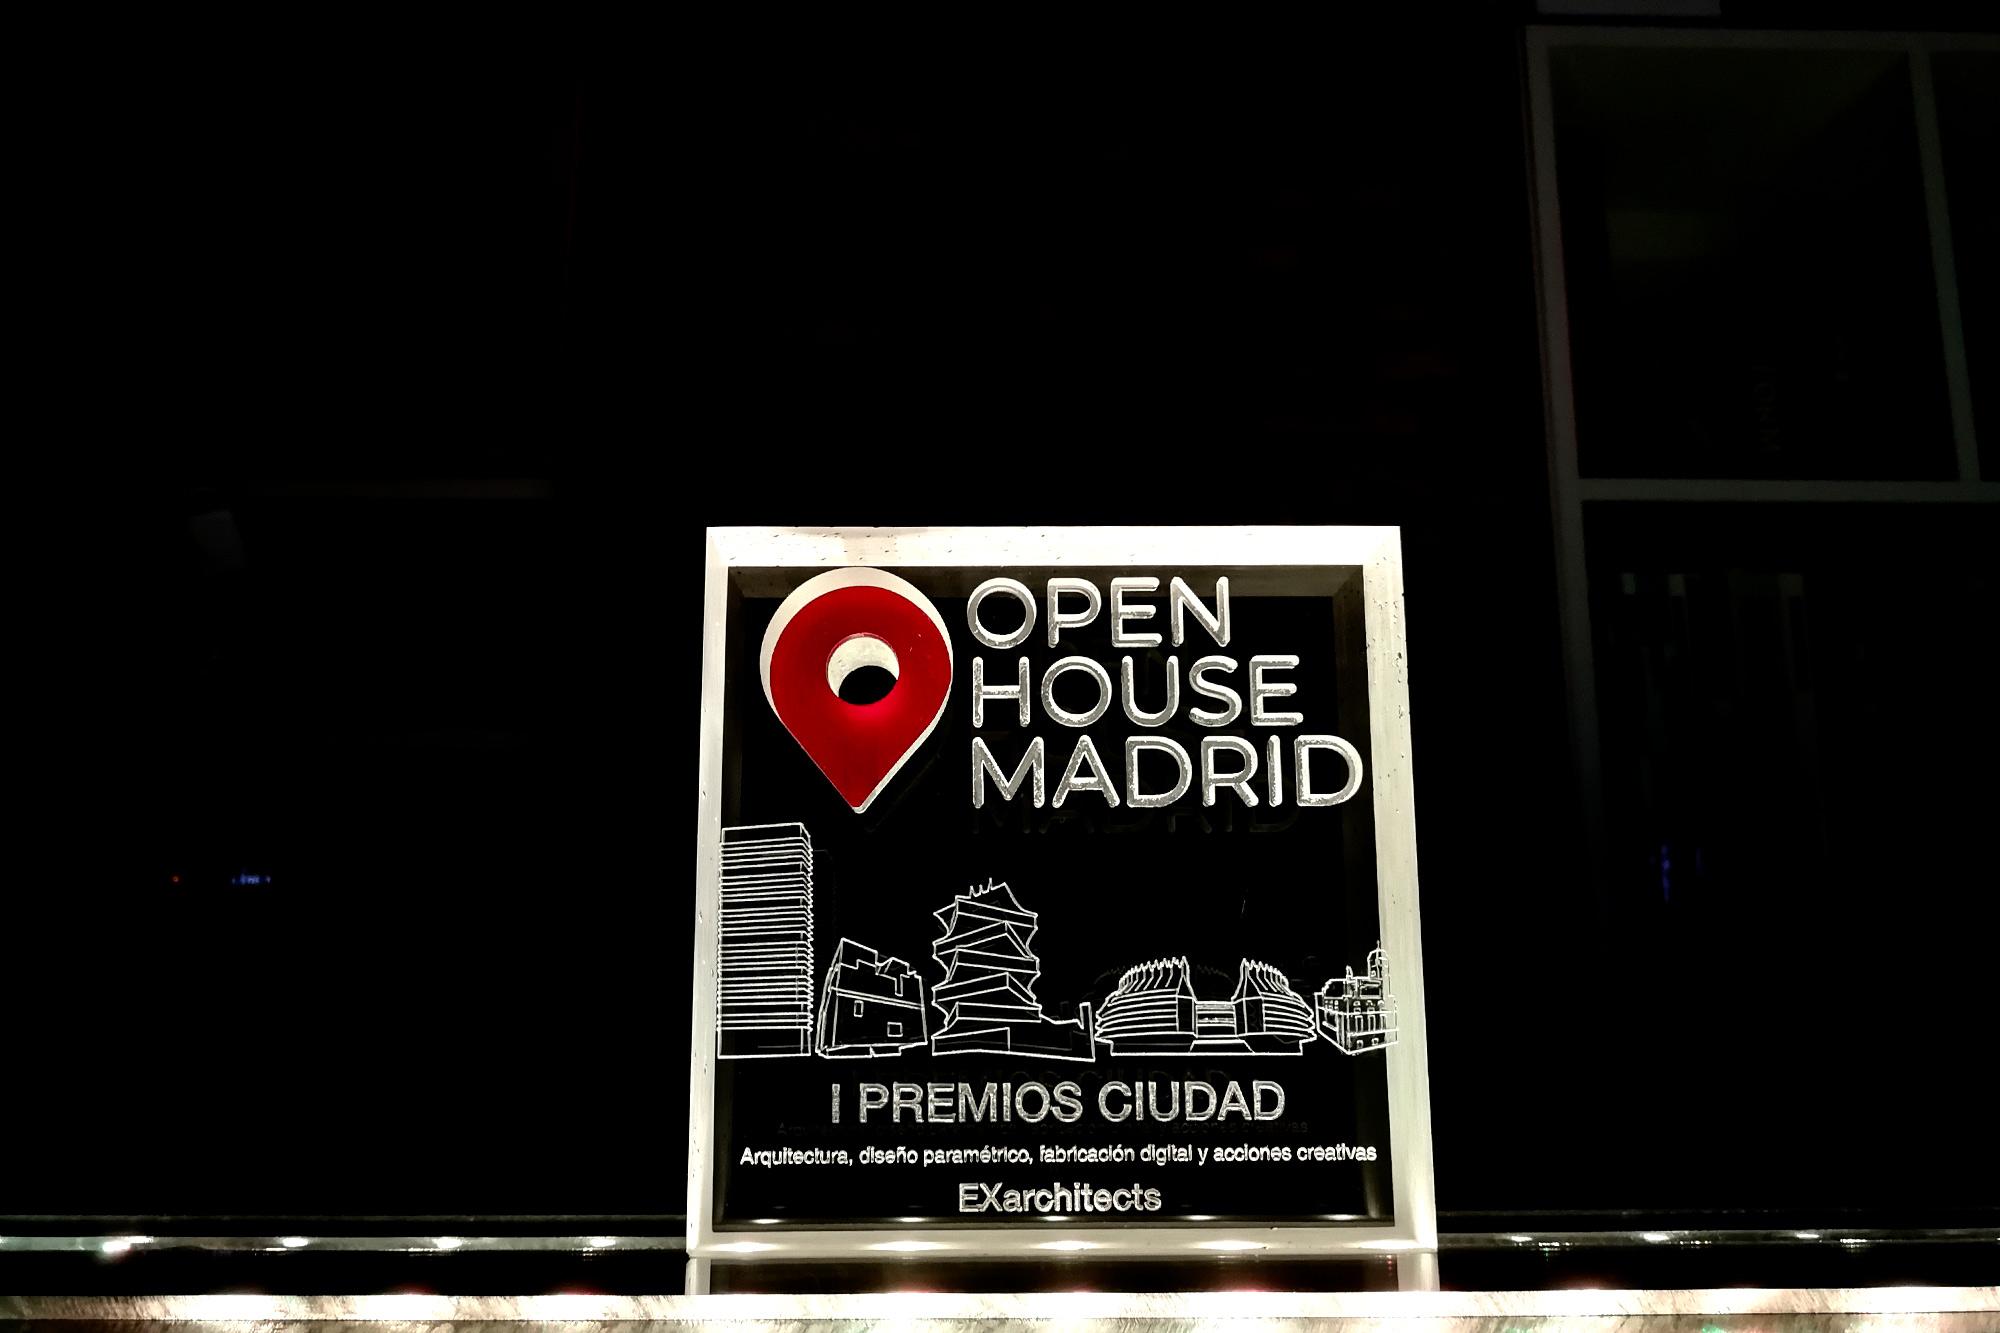 Premios-Ciudad_-Open-House-Madrid_-Diseño-_-EXarchitects_02